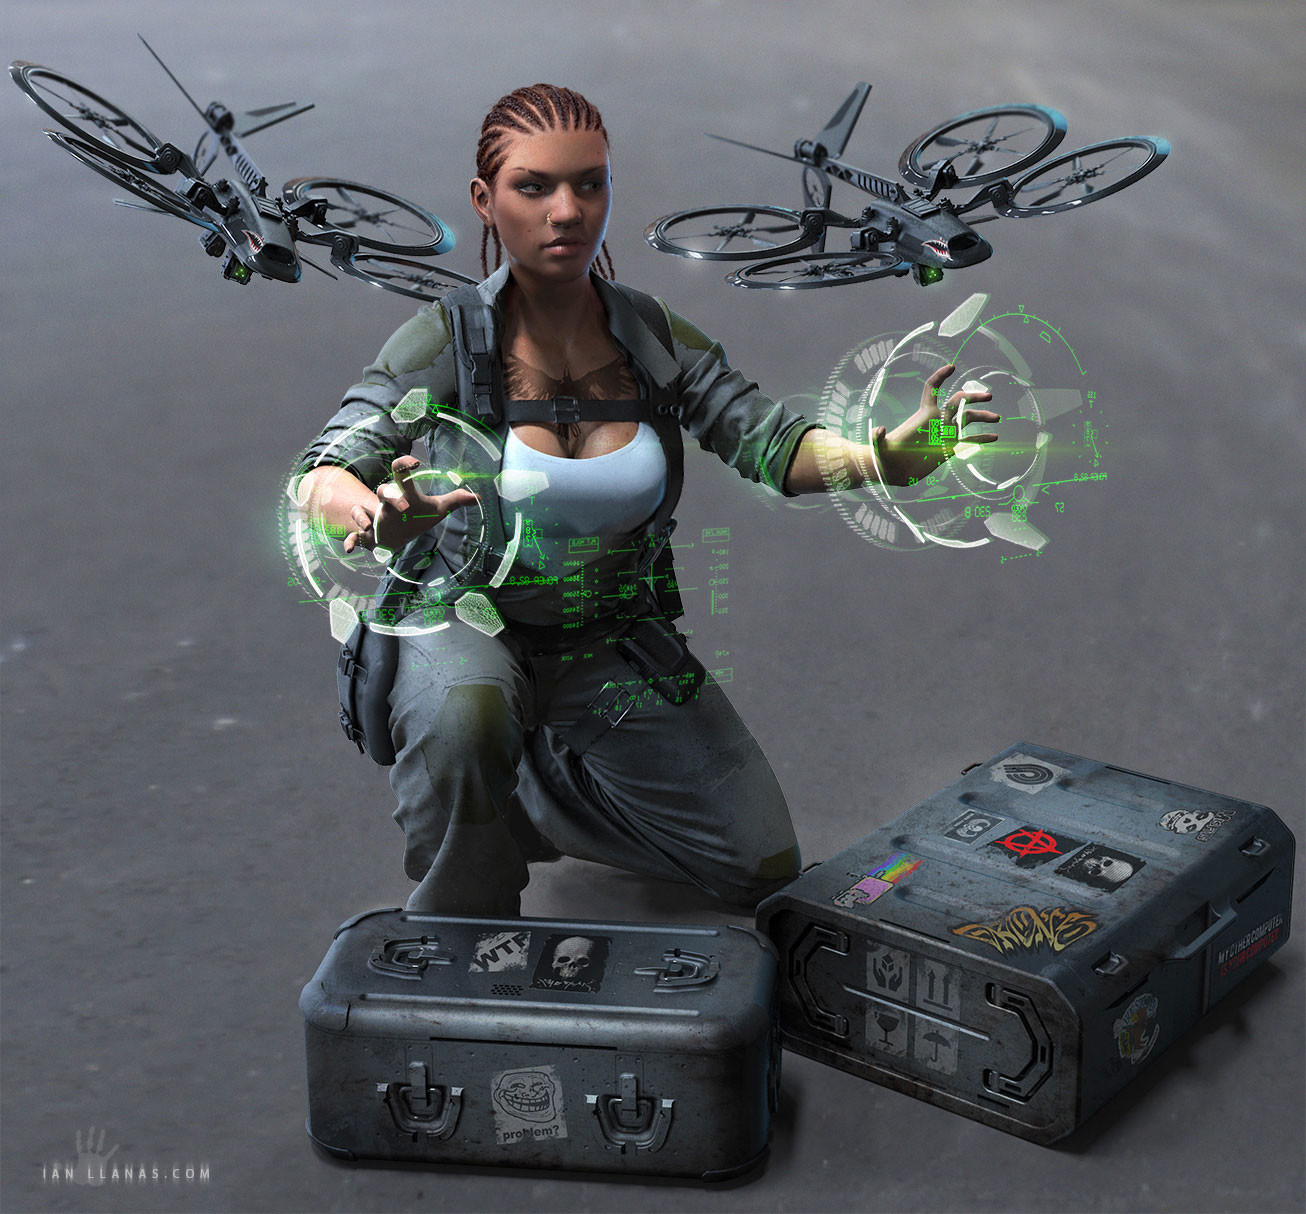 Ian llanas droenpilotredux